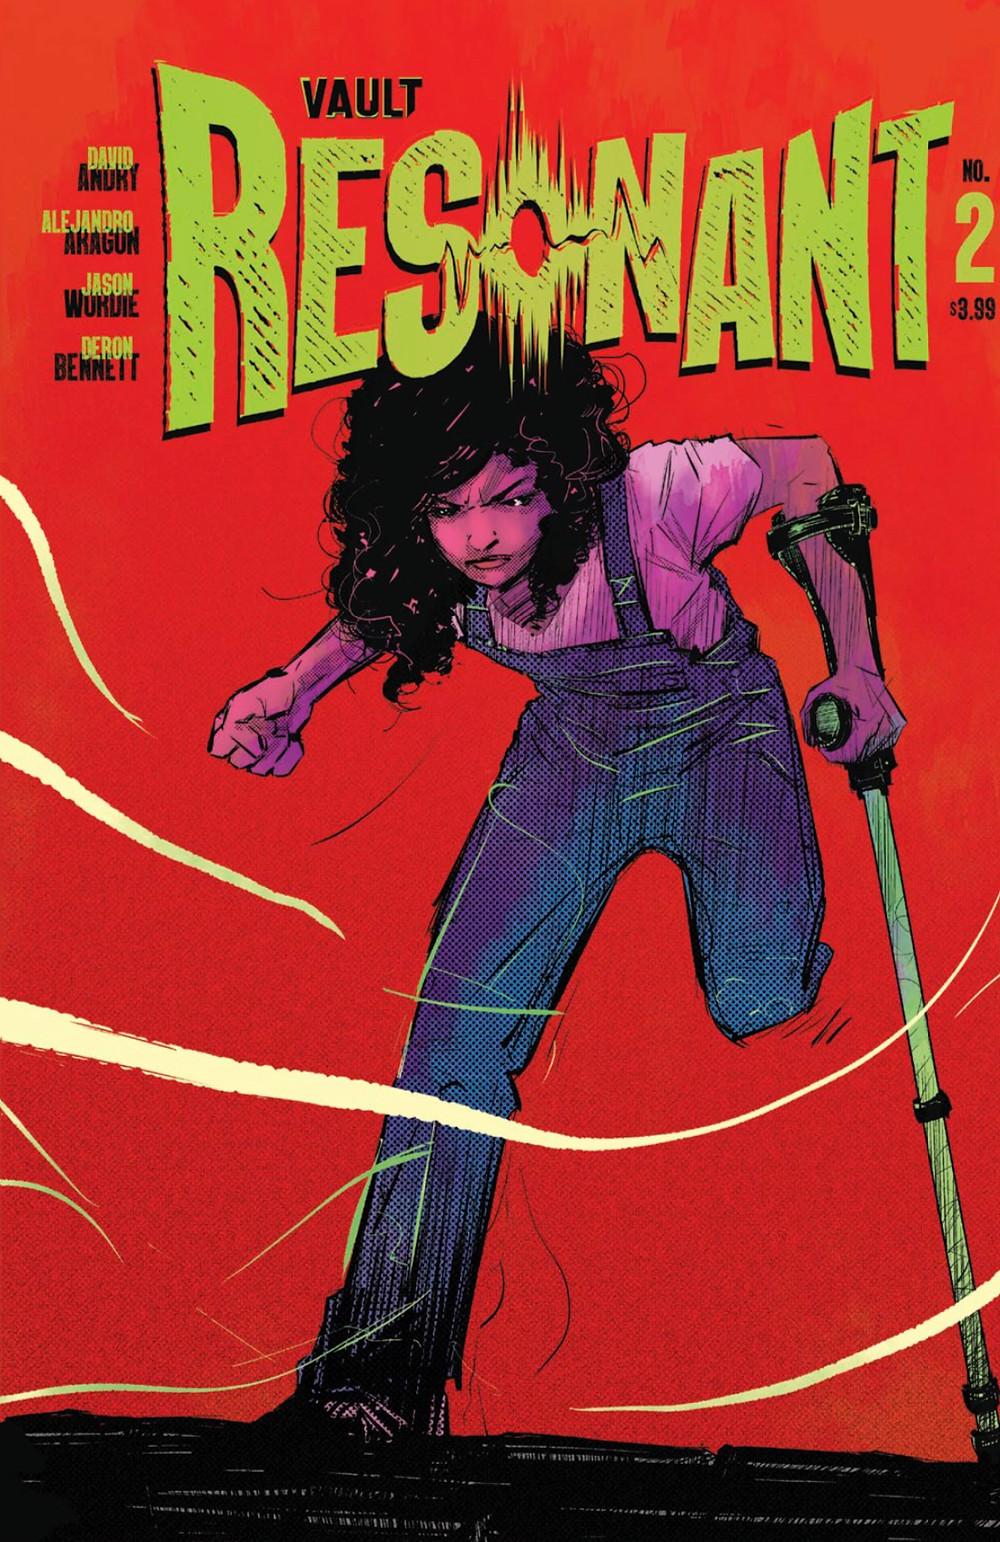 Resonant, issue #2, cover, Vault Comics, Andry/Aragón